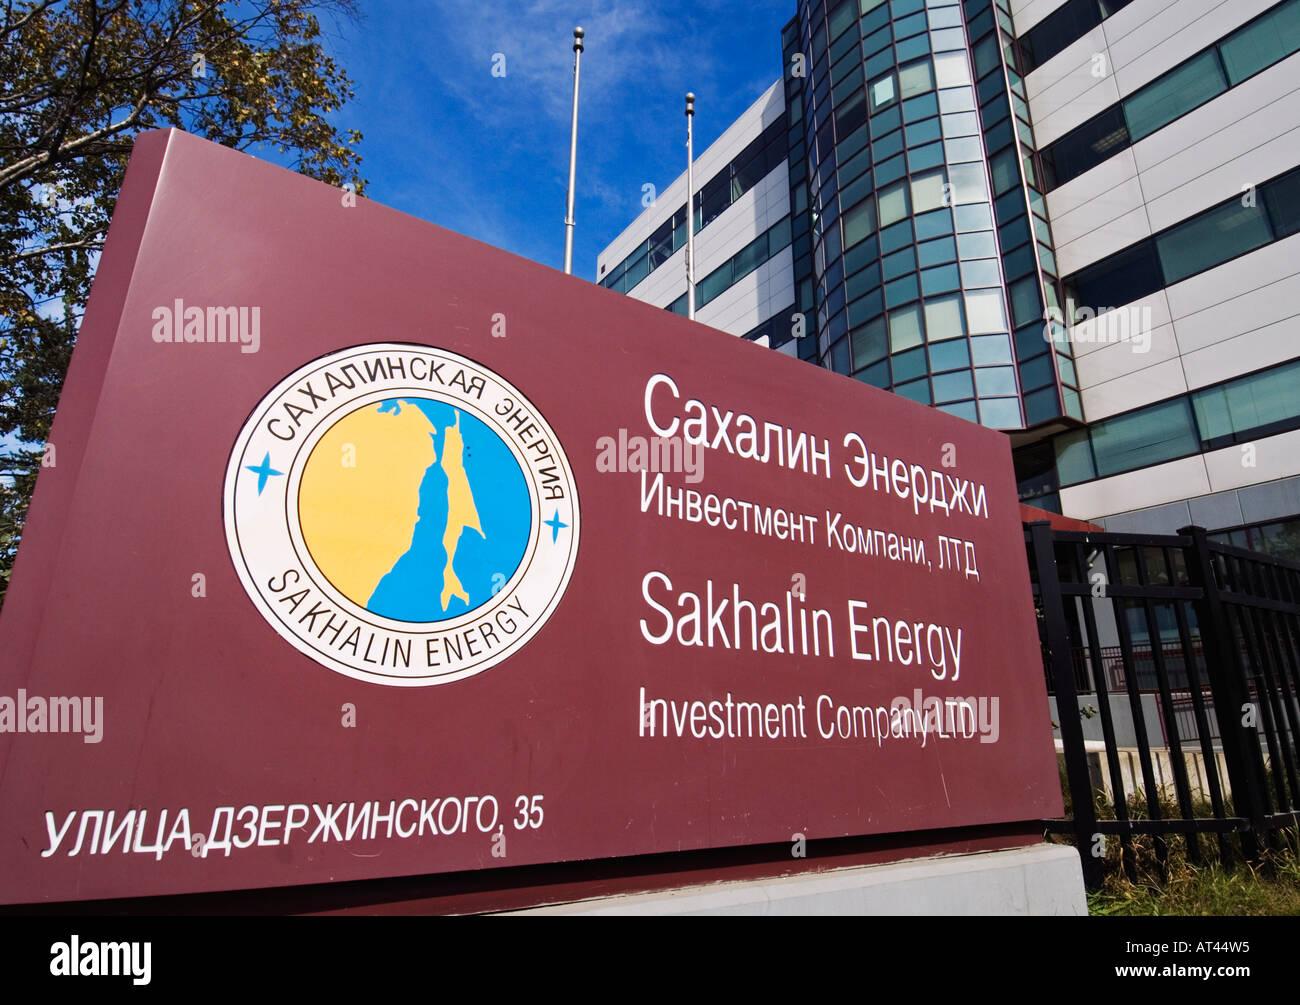 sakhalin energy investment